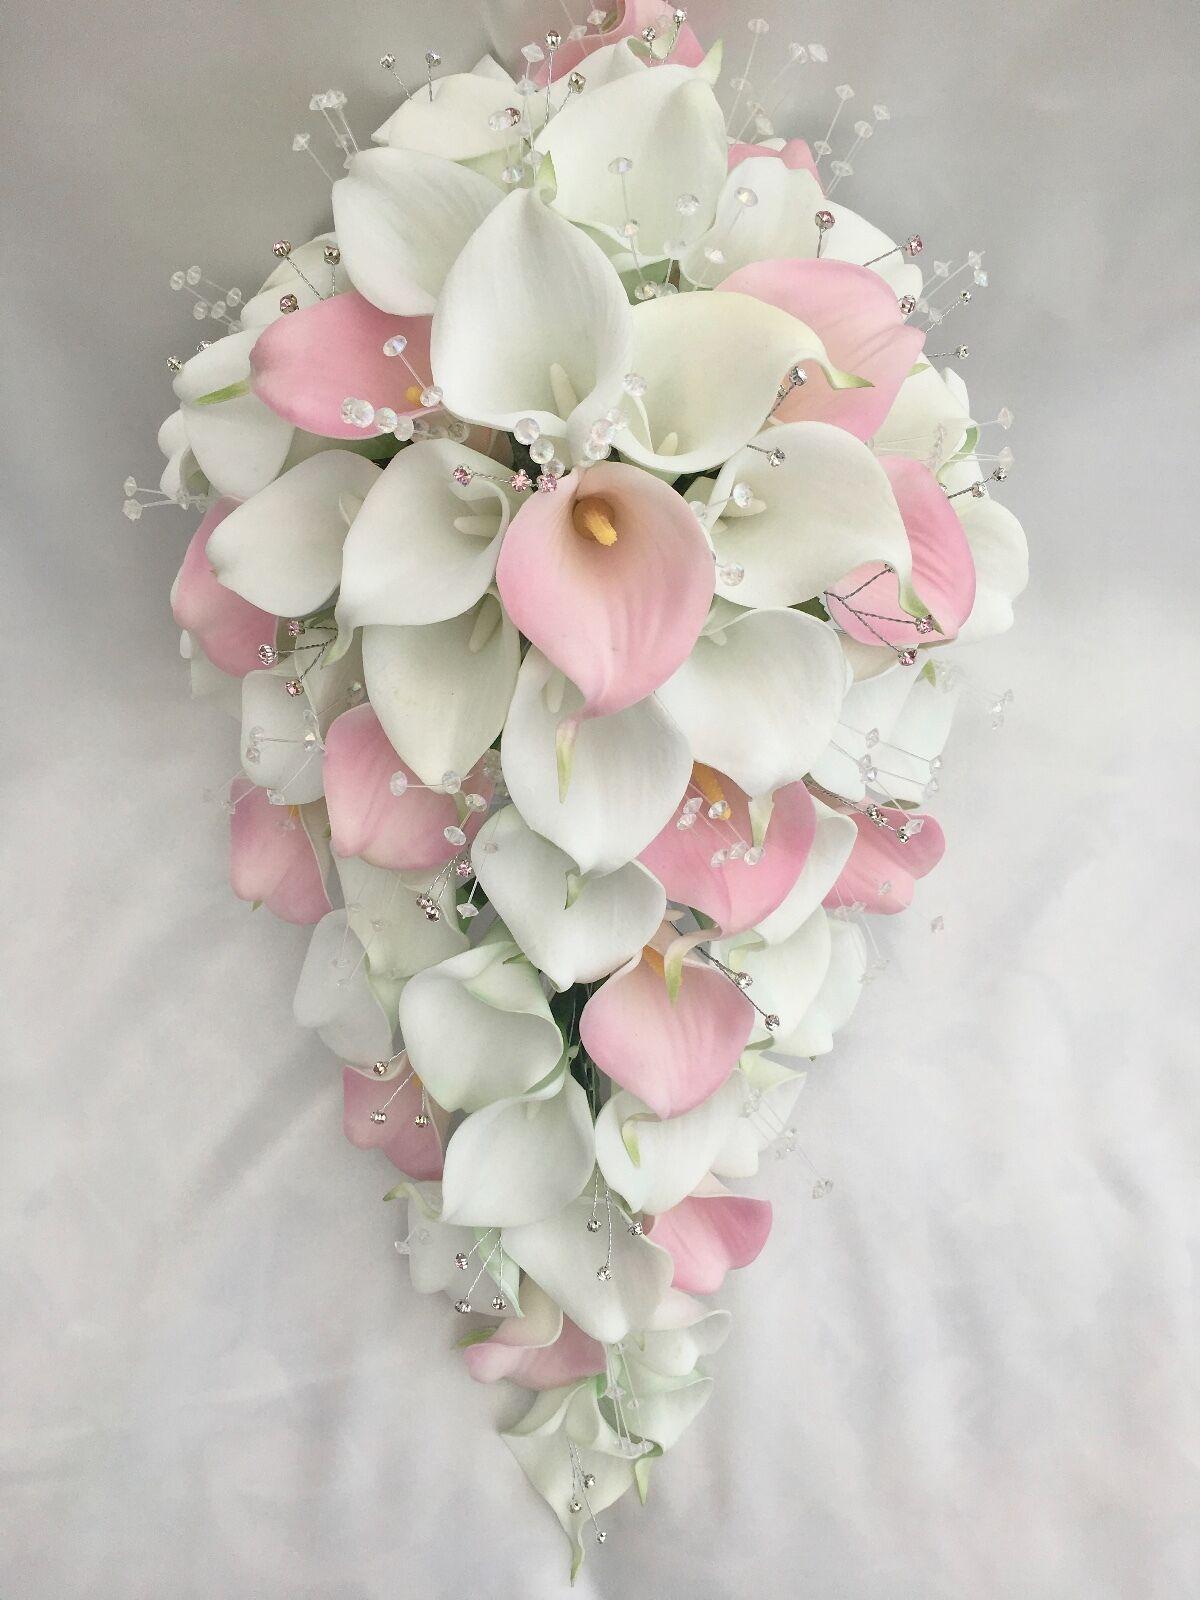 BRIDES BOUQUET, Rosa & Weiß CALLA LILIES, DIAMANTES, ARTIFICIAL WEDDING WEDDING WEDDING FLOWERS 54654b